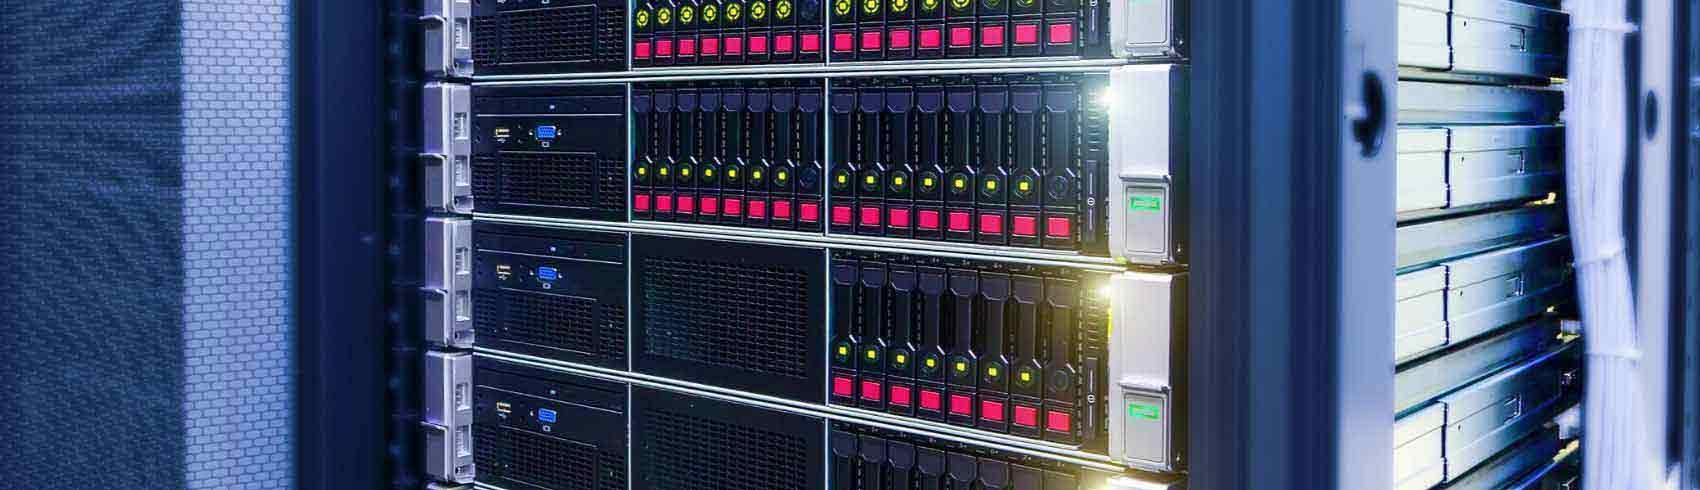 Refurbished Servers, Data Storage & Networking